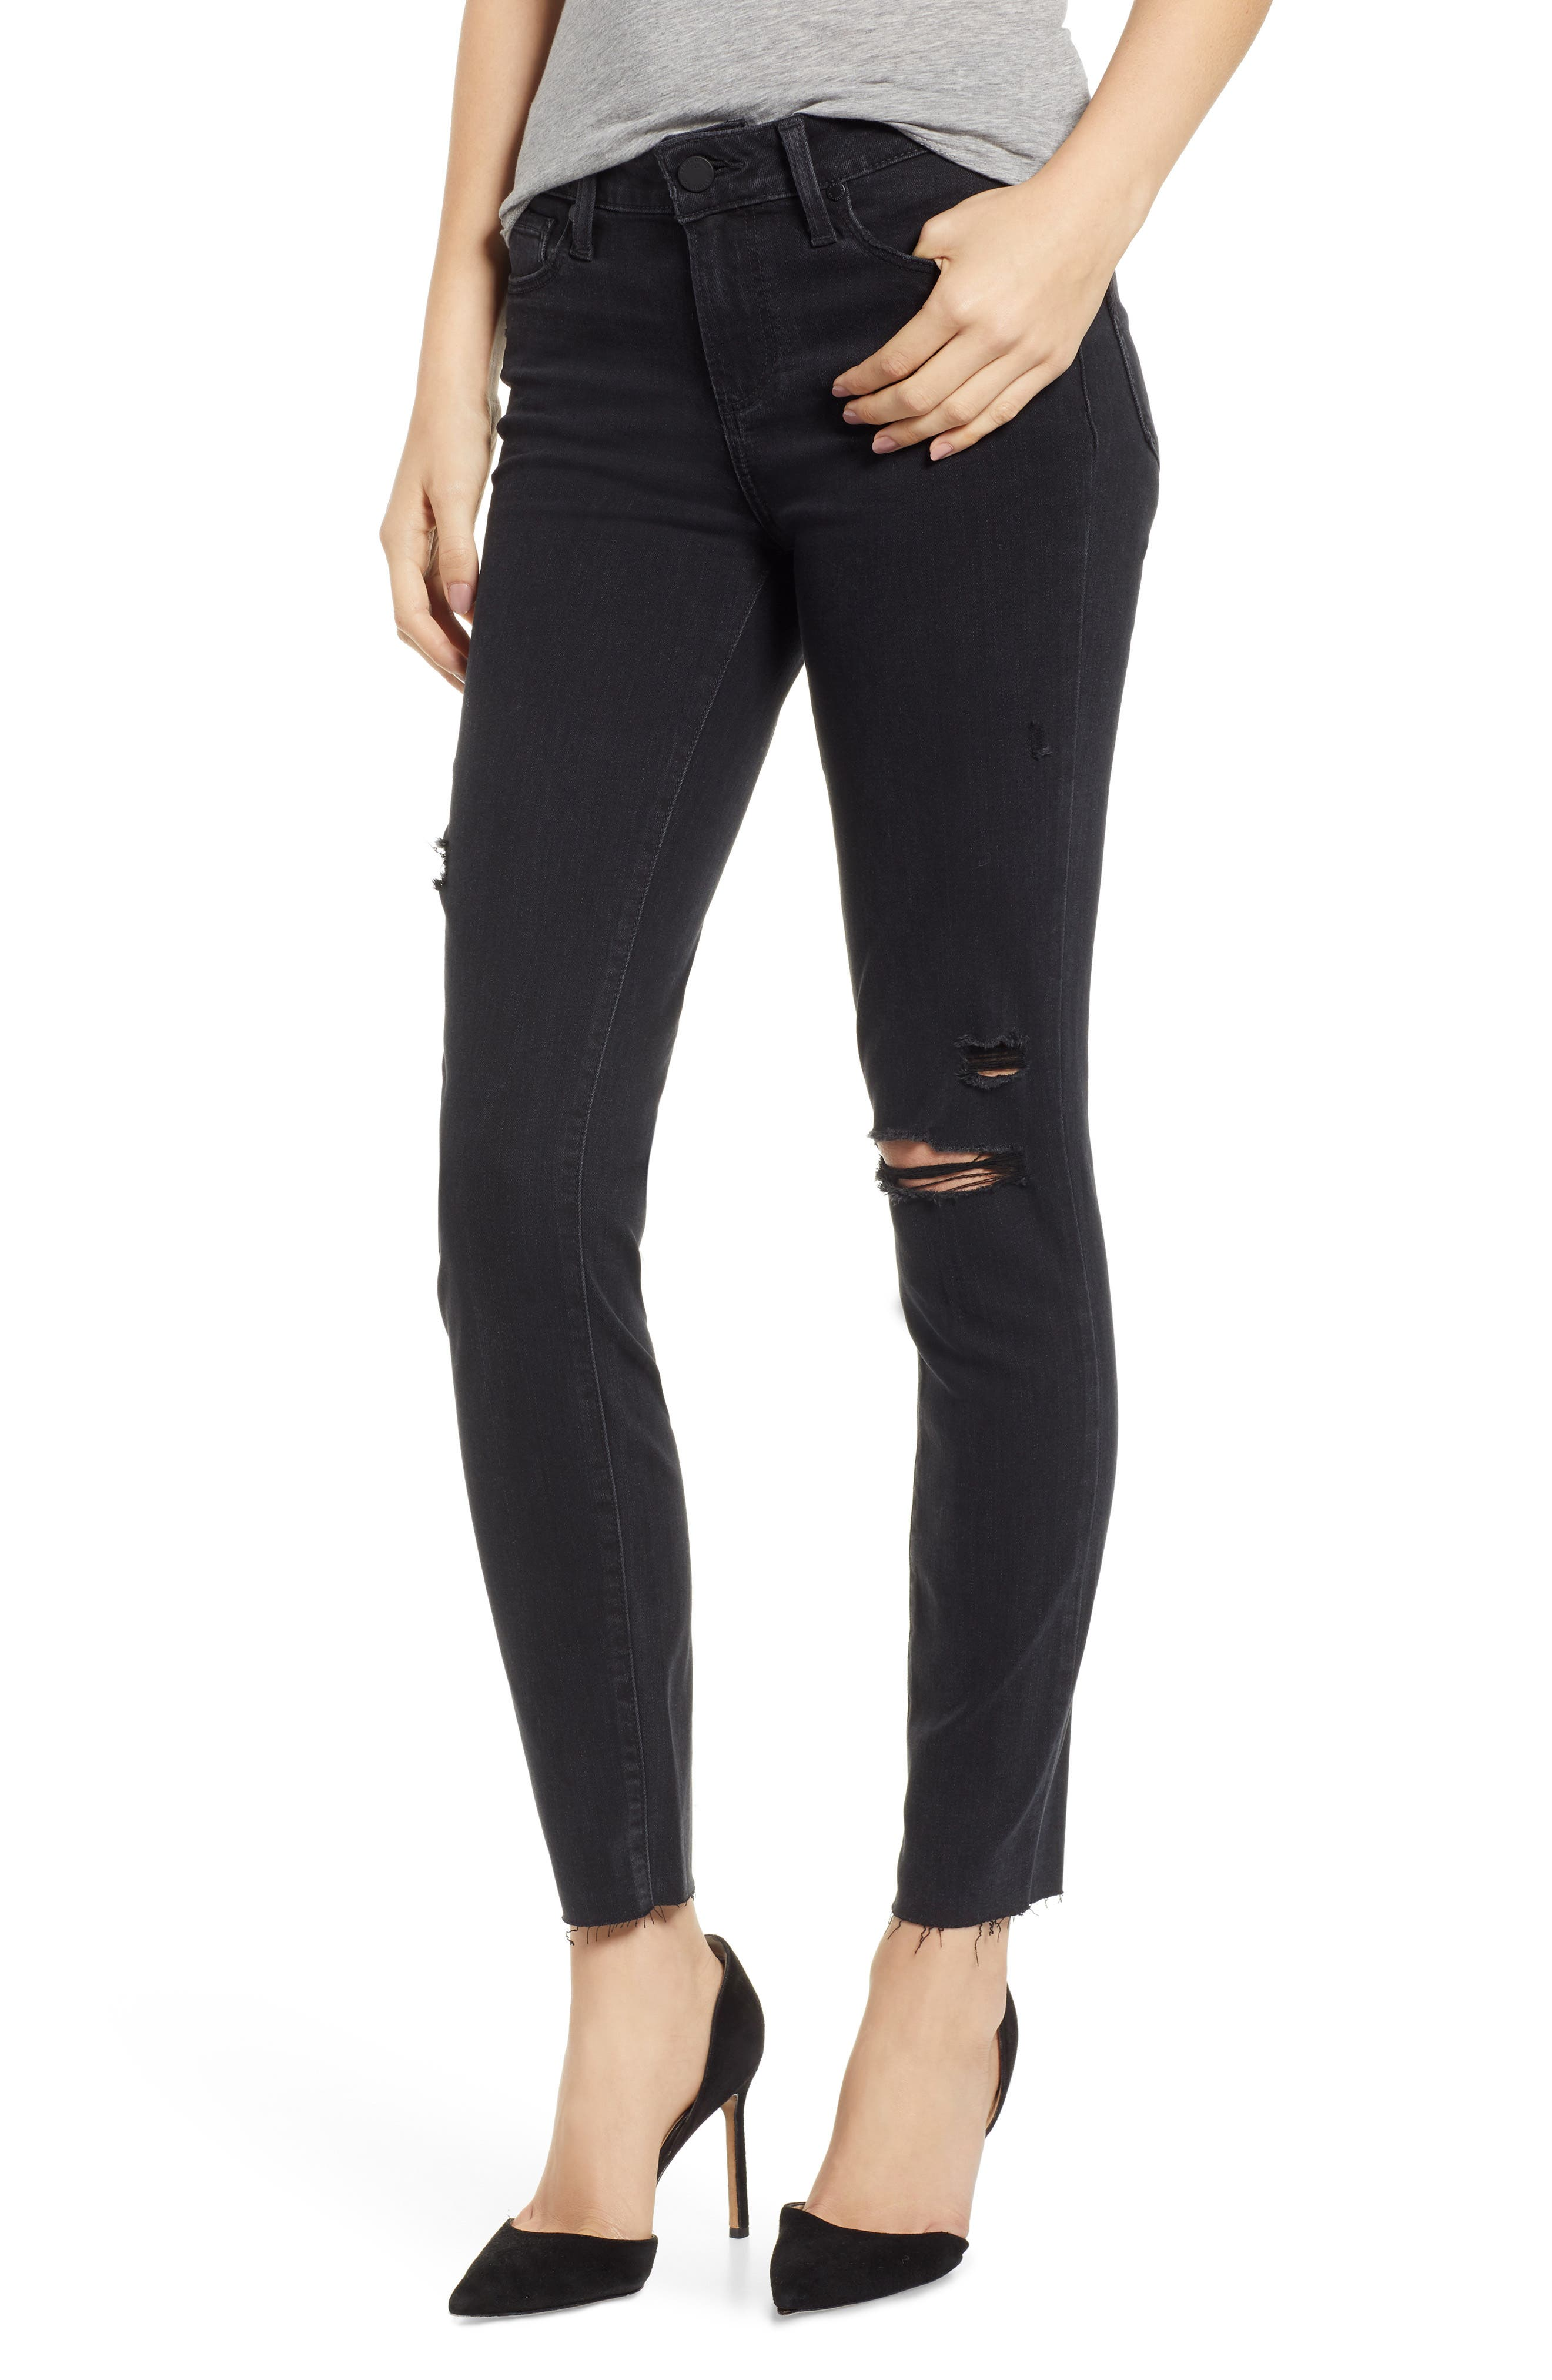 PAIGE Transcend - Verdugo Ankle Skinny Jeans, Main, color, 001